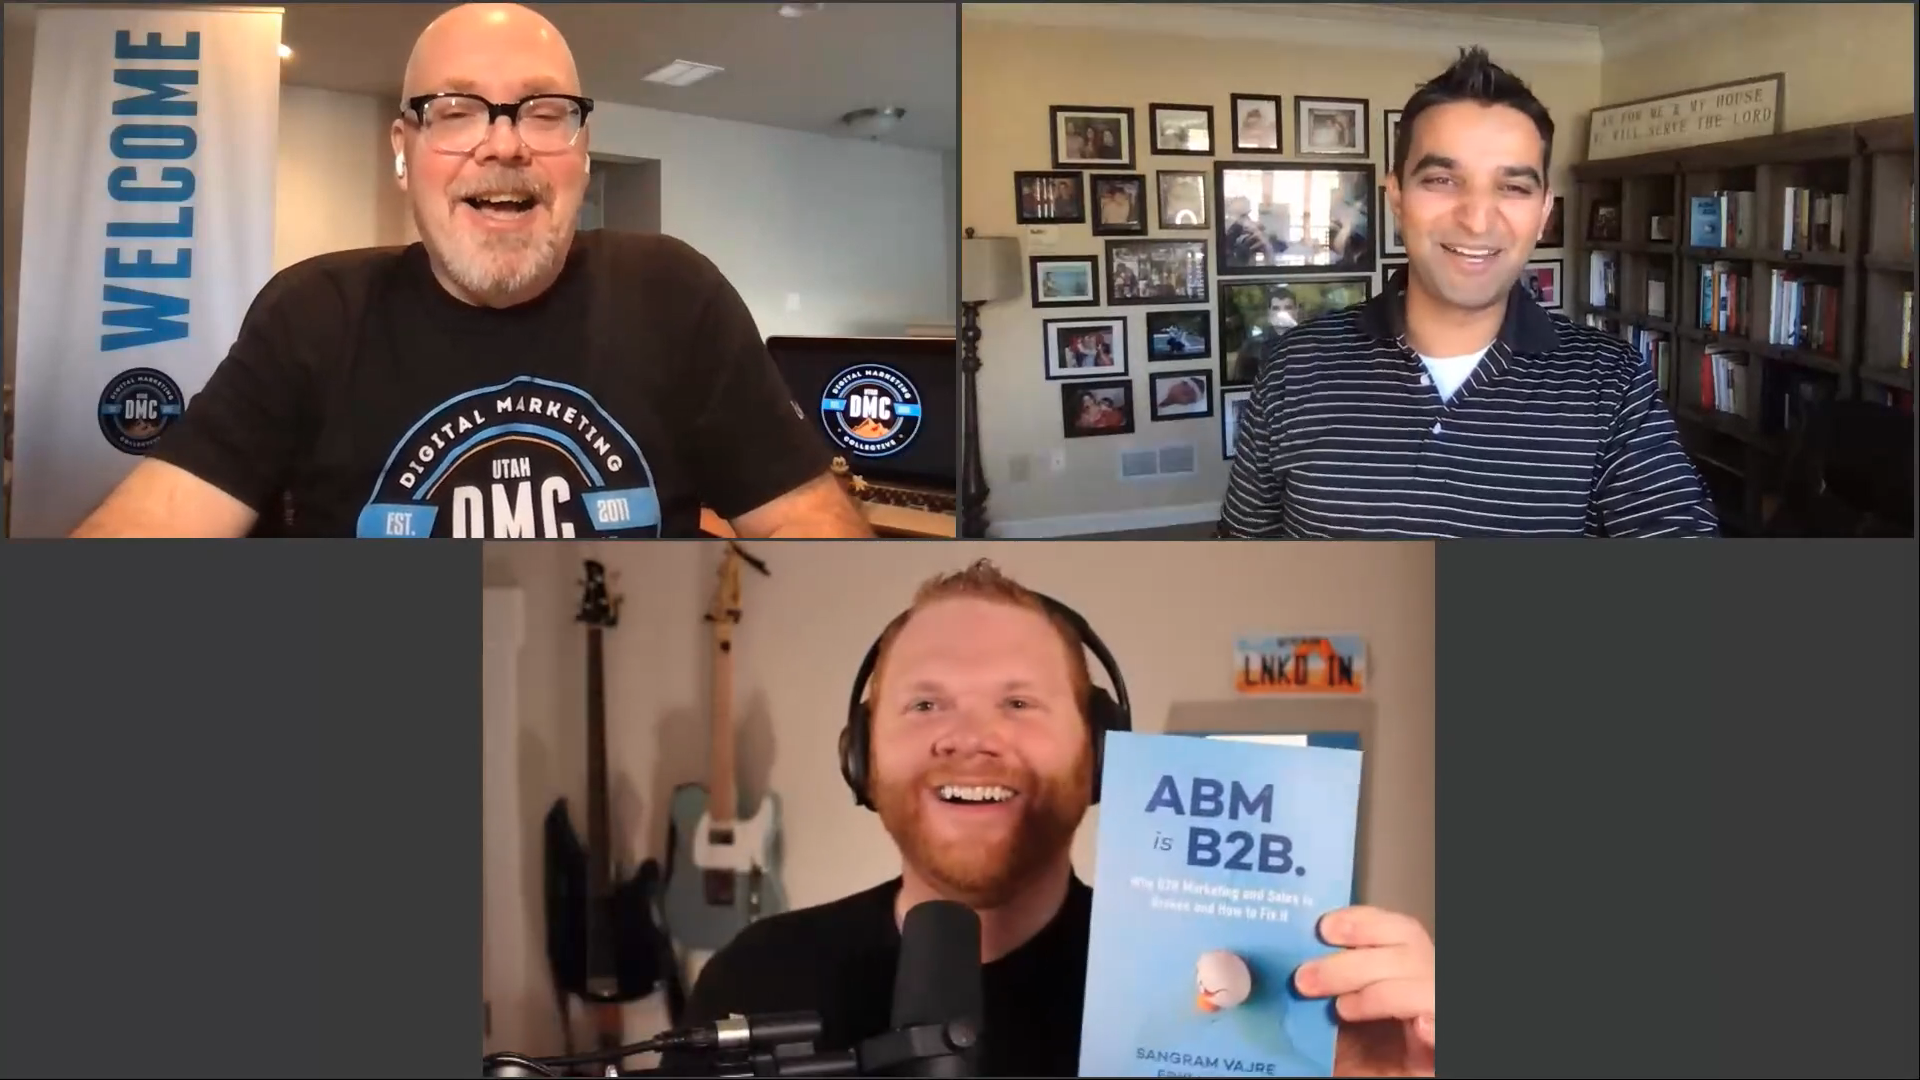 Utah DMC - Sangram Vajre - AJ Wilcox - Darin Berntson - The Secret Formula to become a CMO